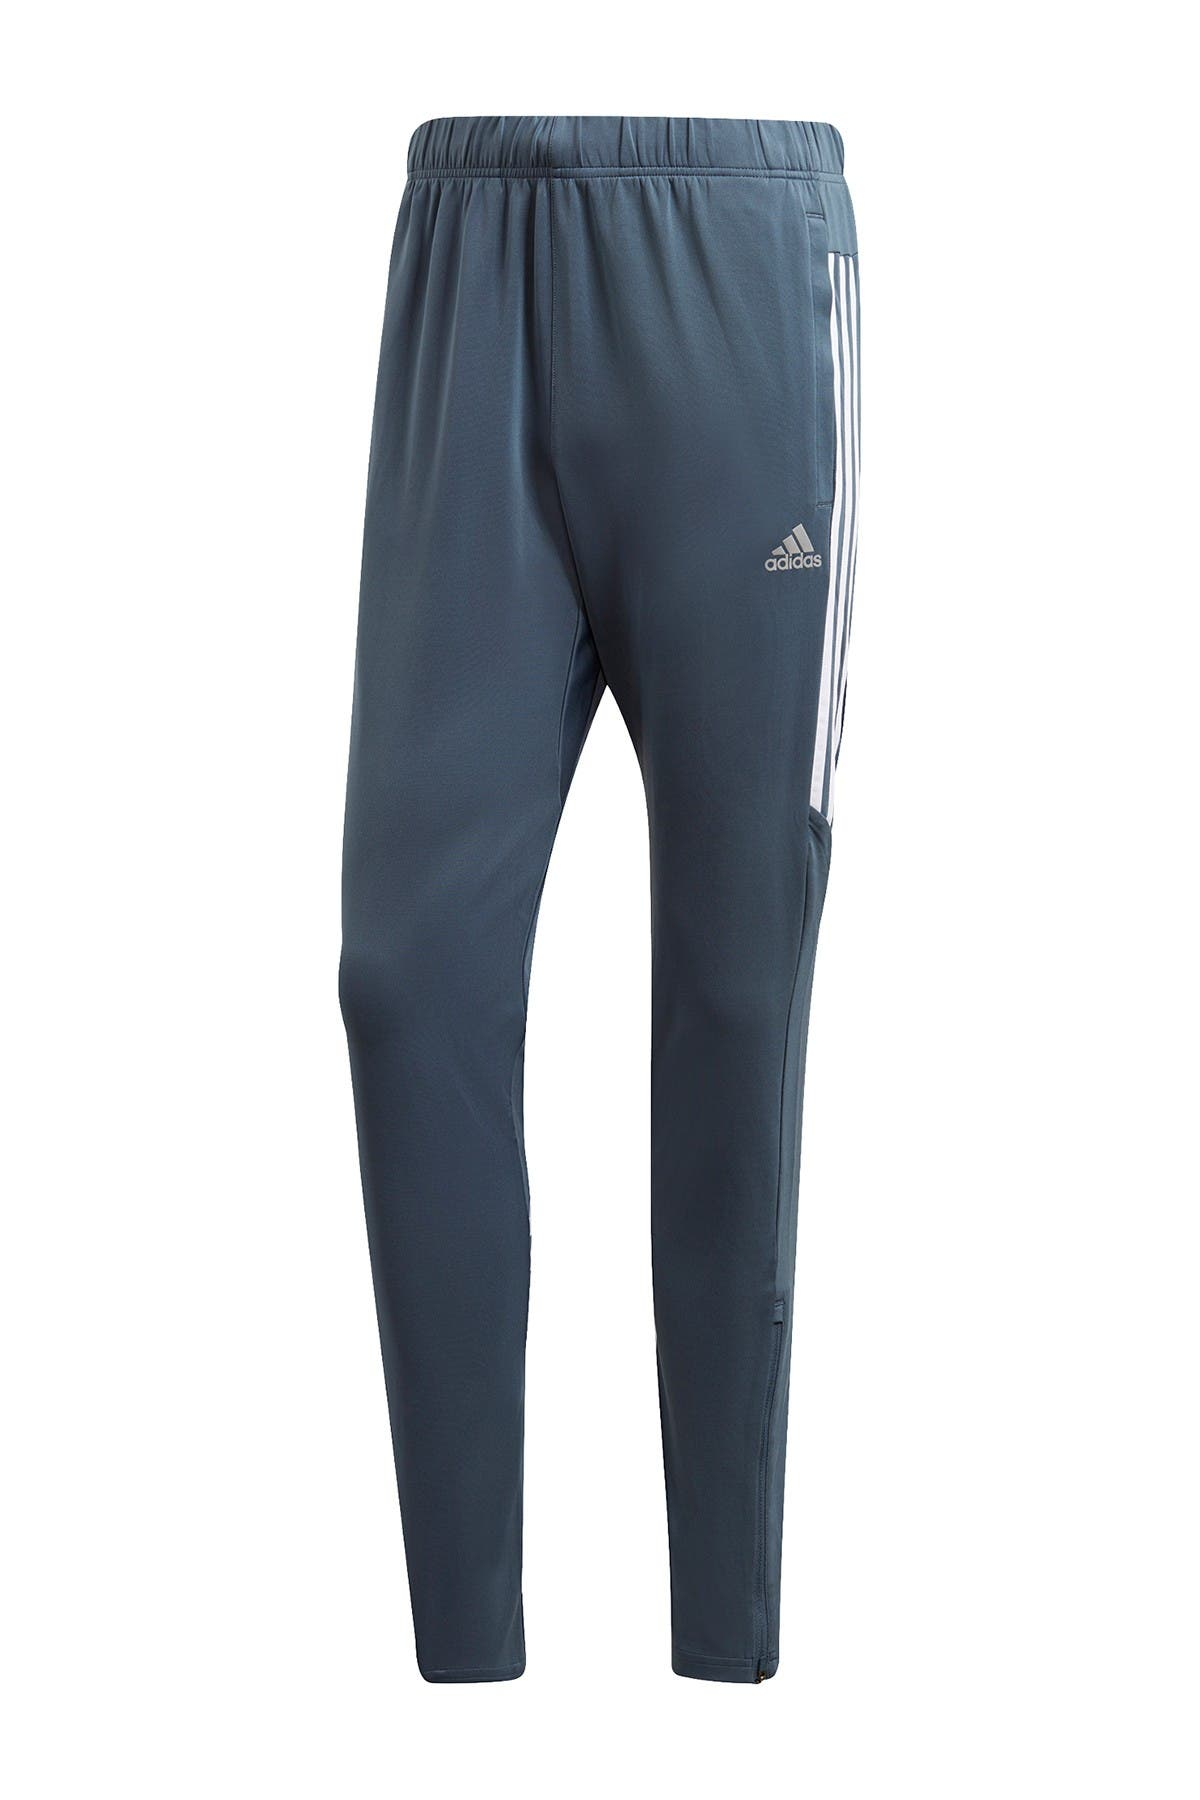 Image of adidas Astro Pants